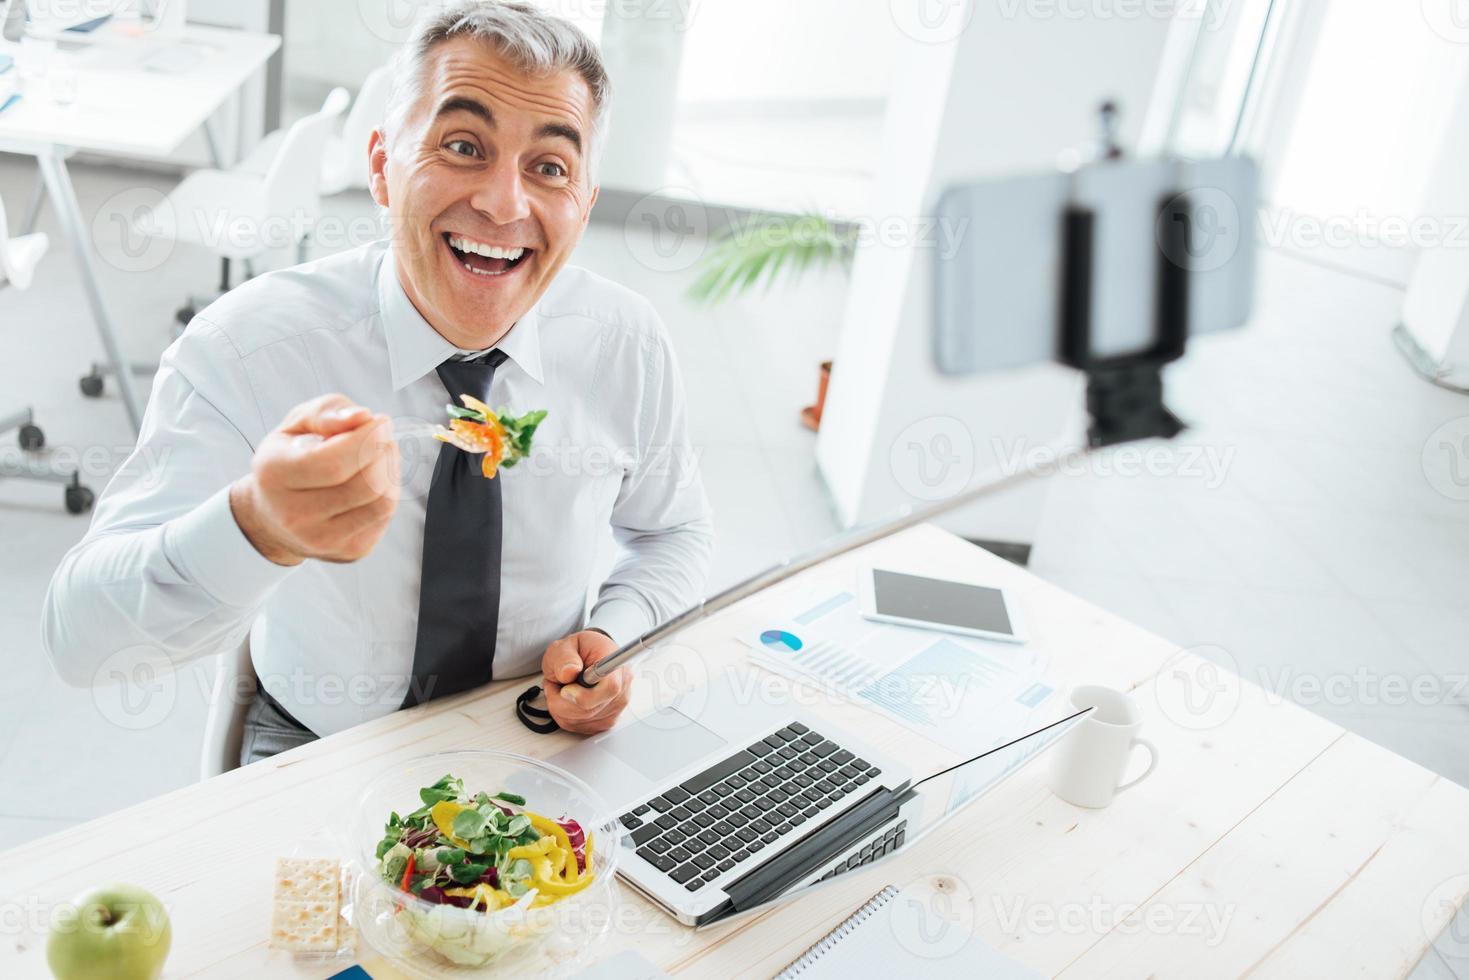 affärsman som tar selfies under sin lunchpaus foto